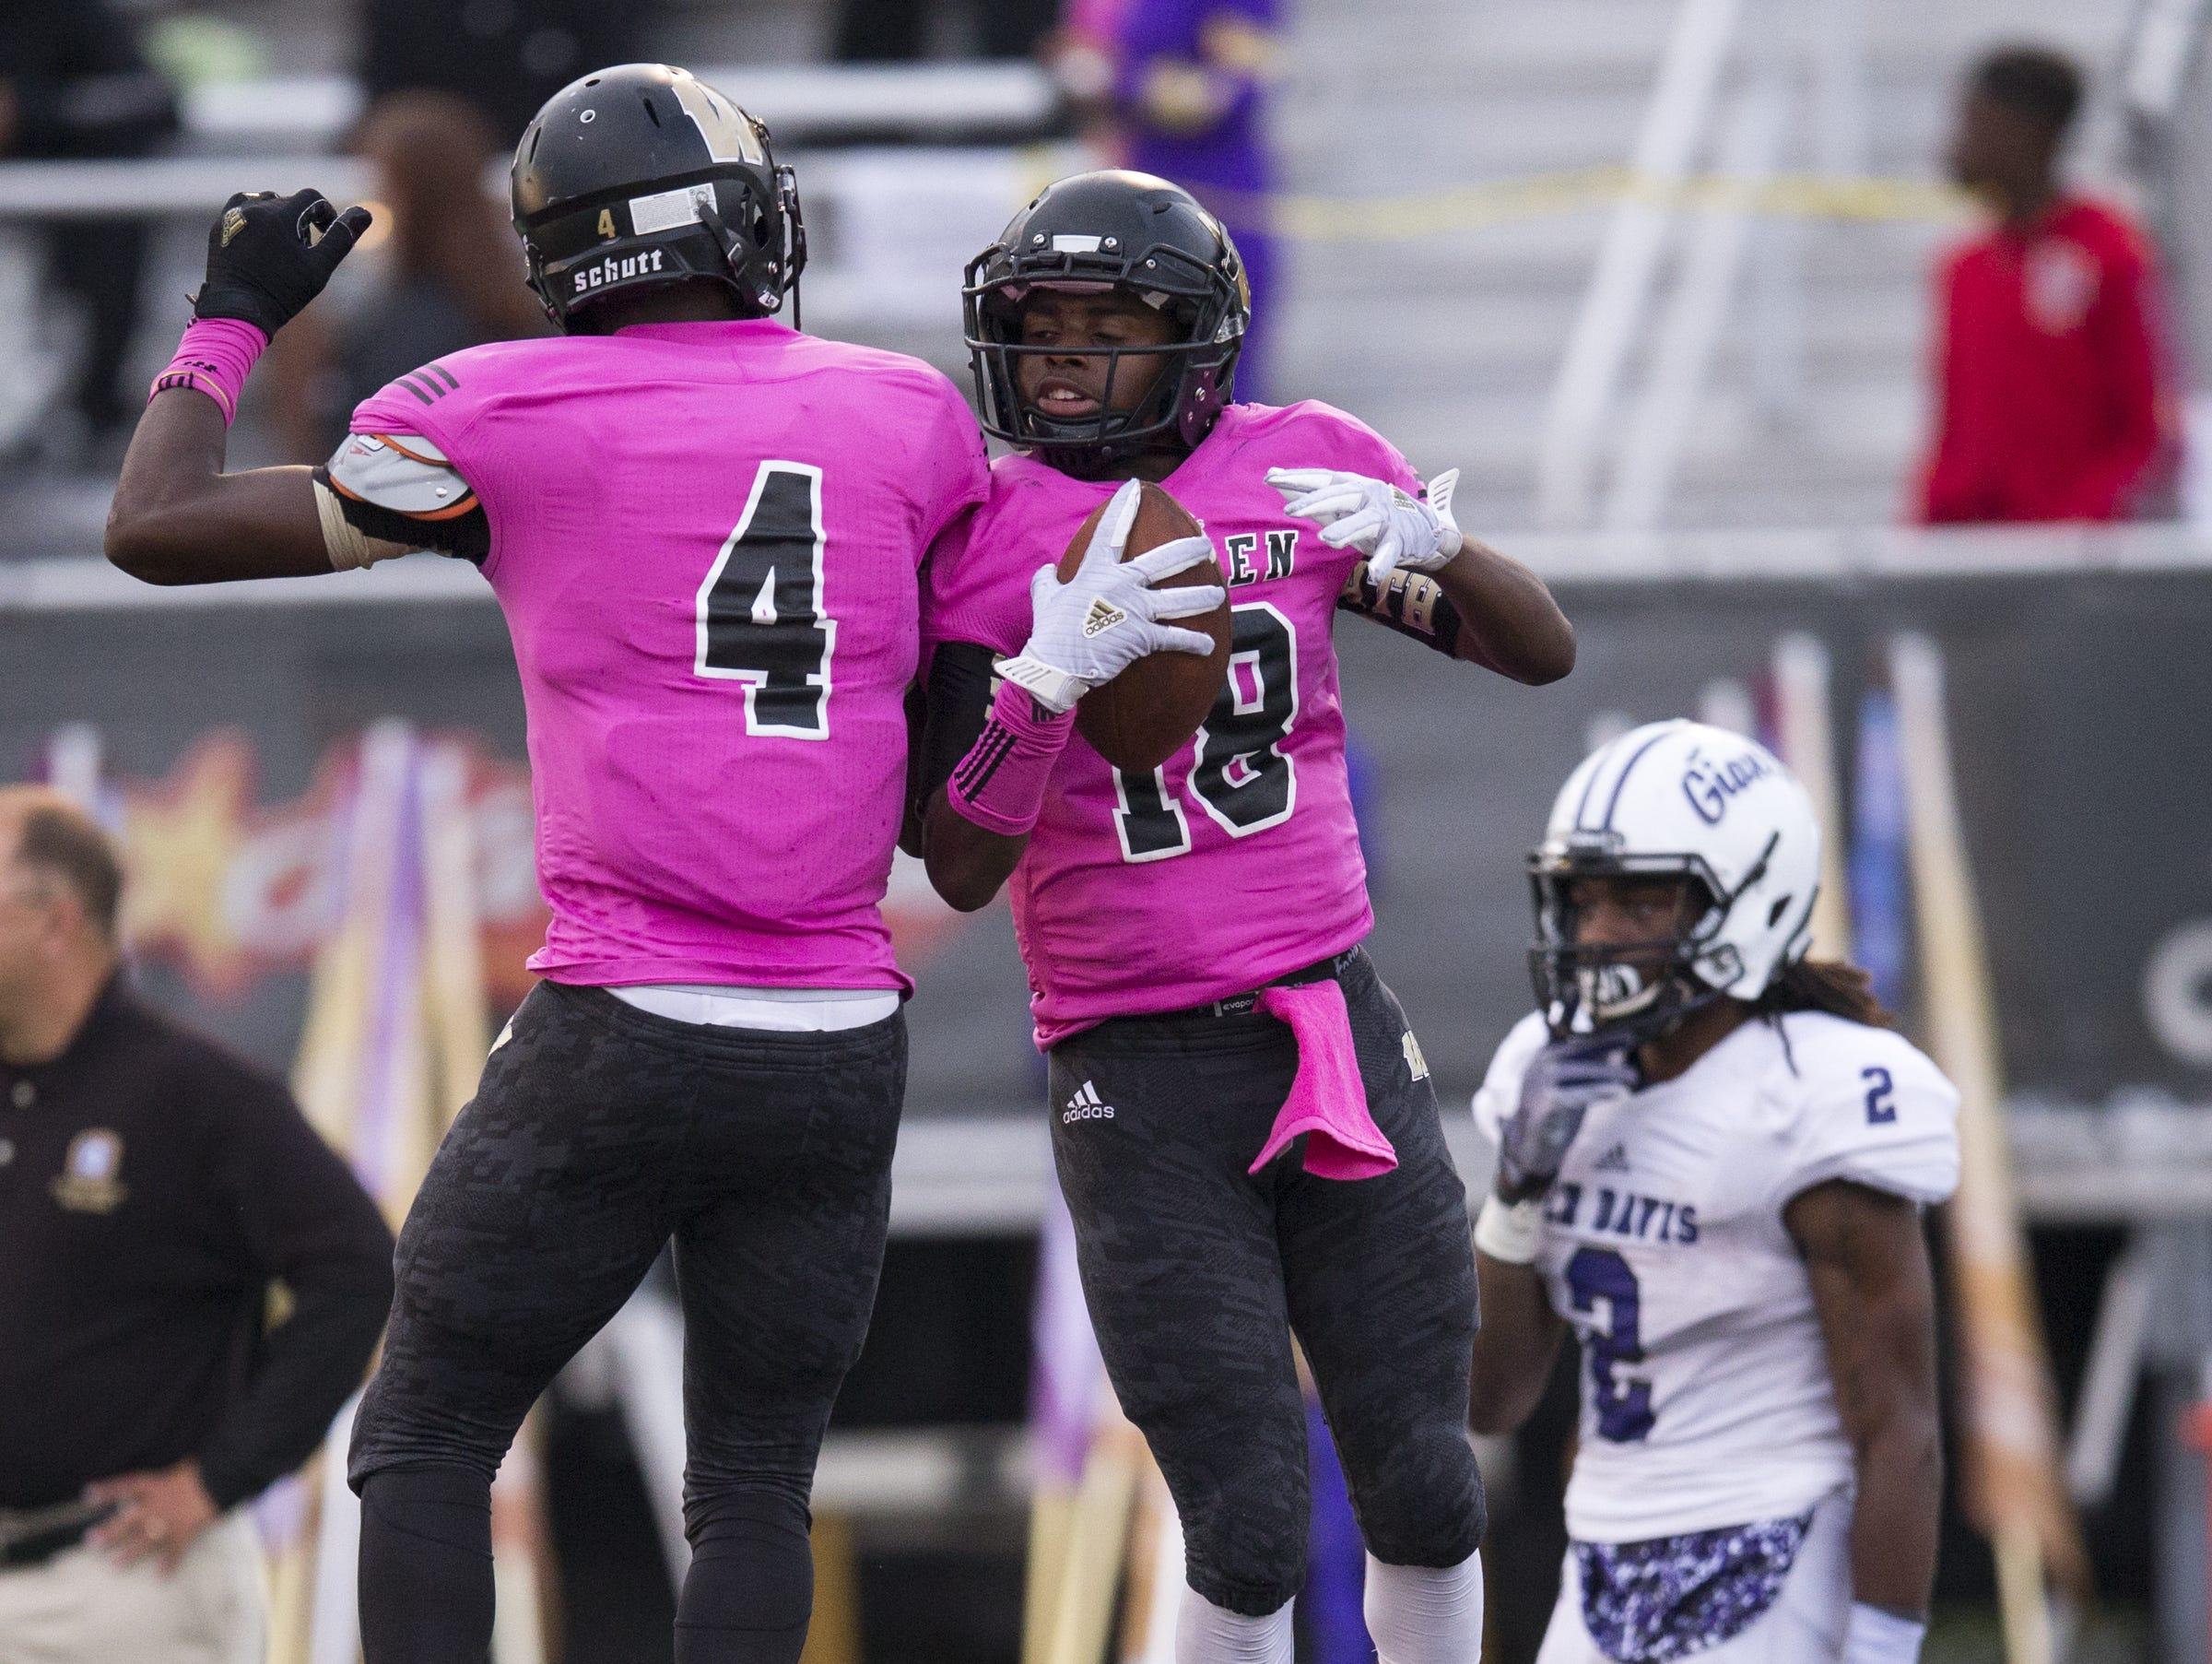 David Bell (left), and Warren Central High School teammate Dajour Griffie celebrate Griffie's first half touchdown, Ben Davis at Warren Central High School football, Indianapolis, Friday, Sept. 16, 2016. WCHS won 35-34.